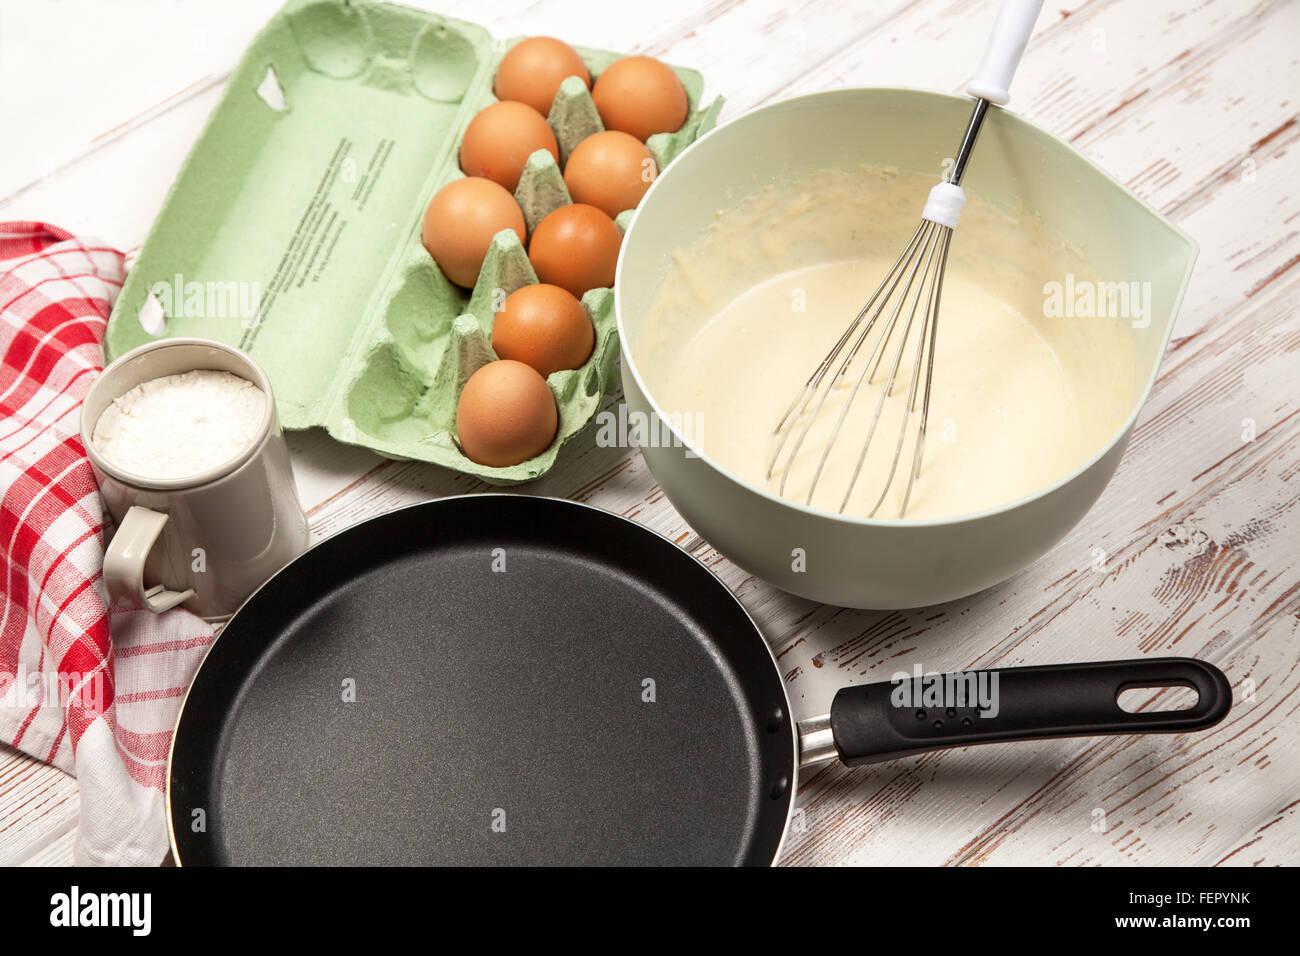 Preparing batter for pancakes Stock Photo